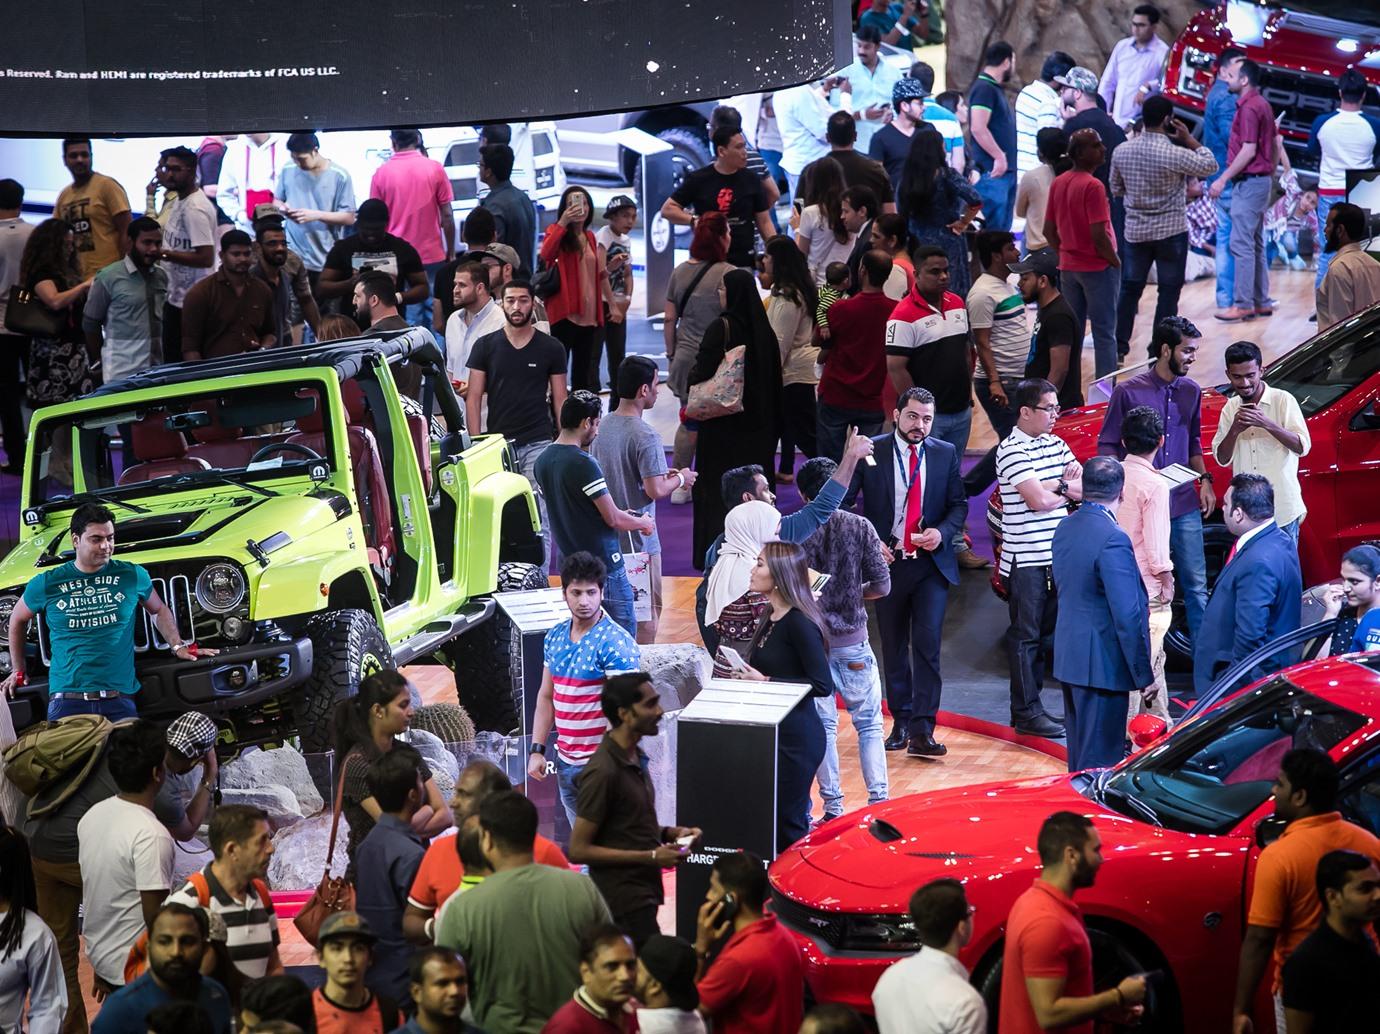 Qatar Motor Show 2018: 'Driving to Innovation'